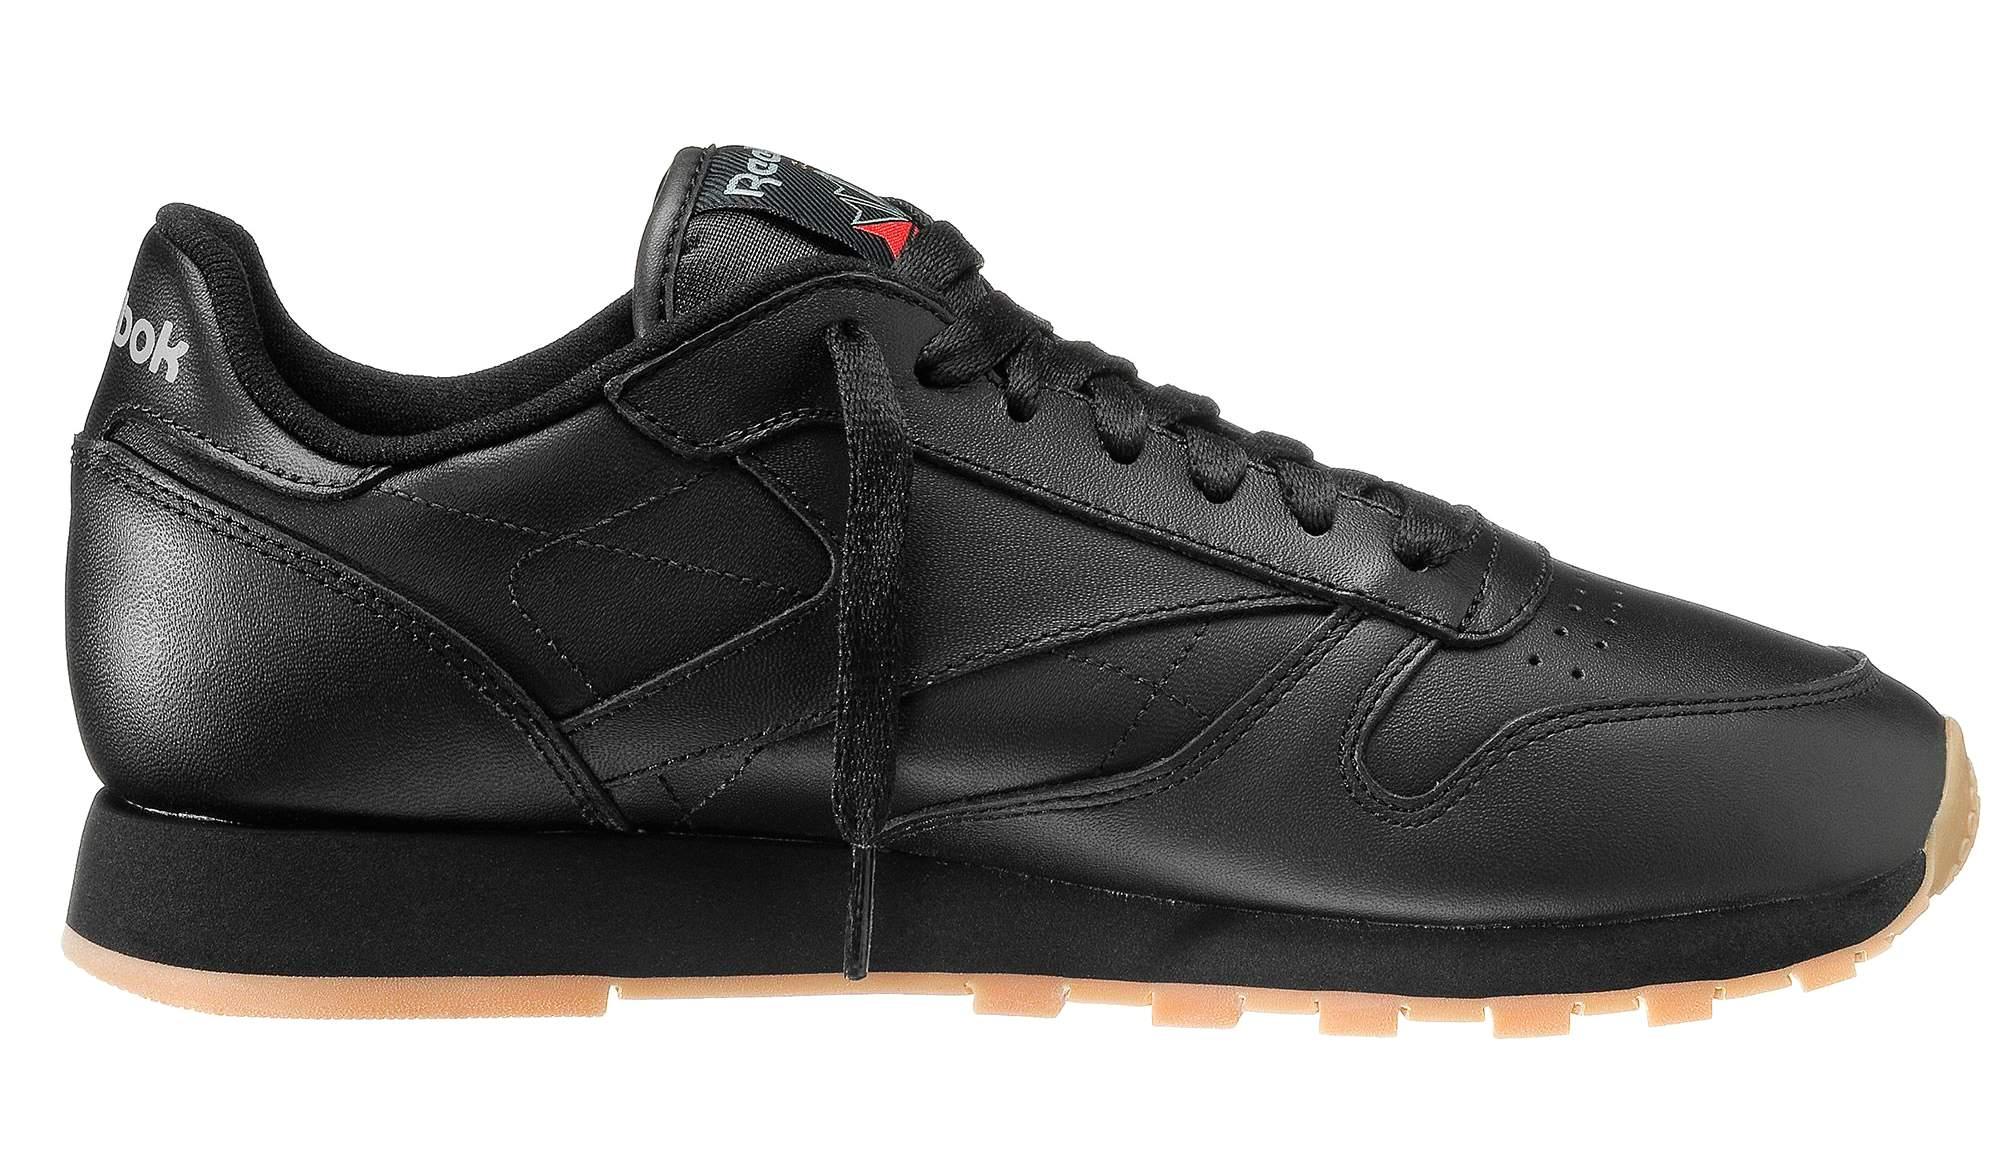 051bc96fdf9 Details about Reebok Boys Black Gum Classic Leather Trainers Shoes  49800   UK 3 EU 34.5